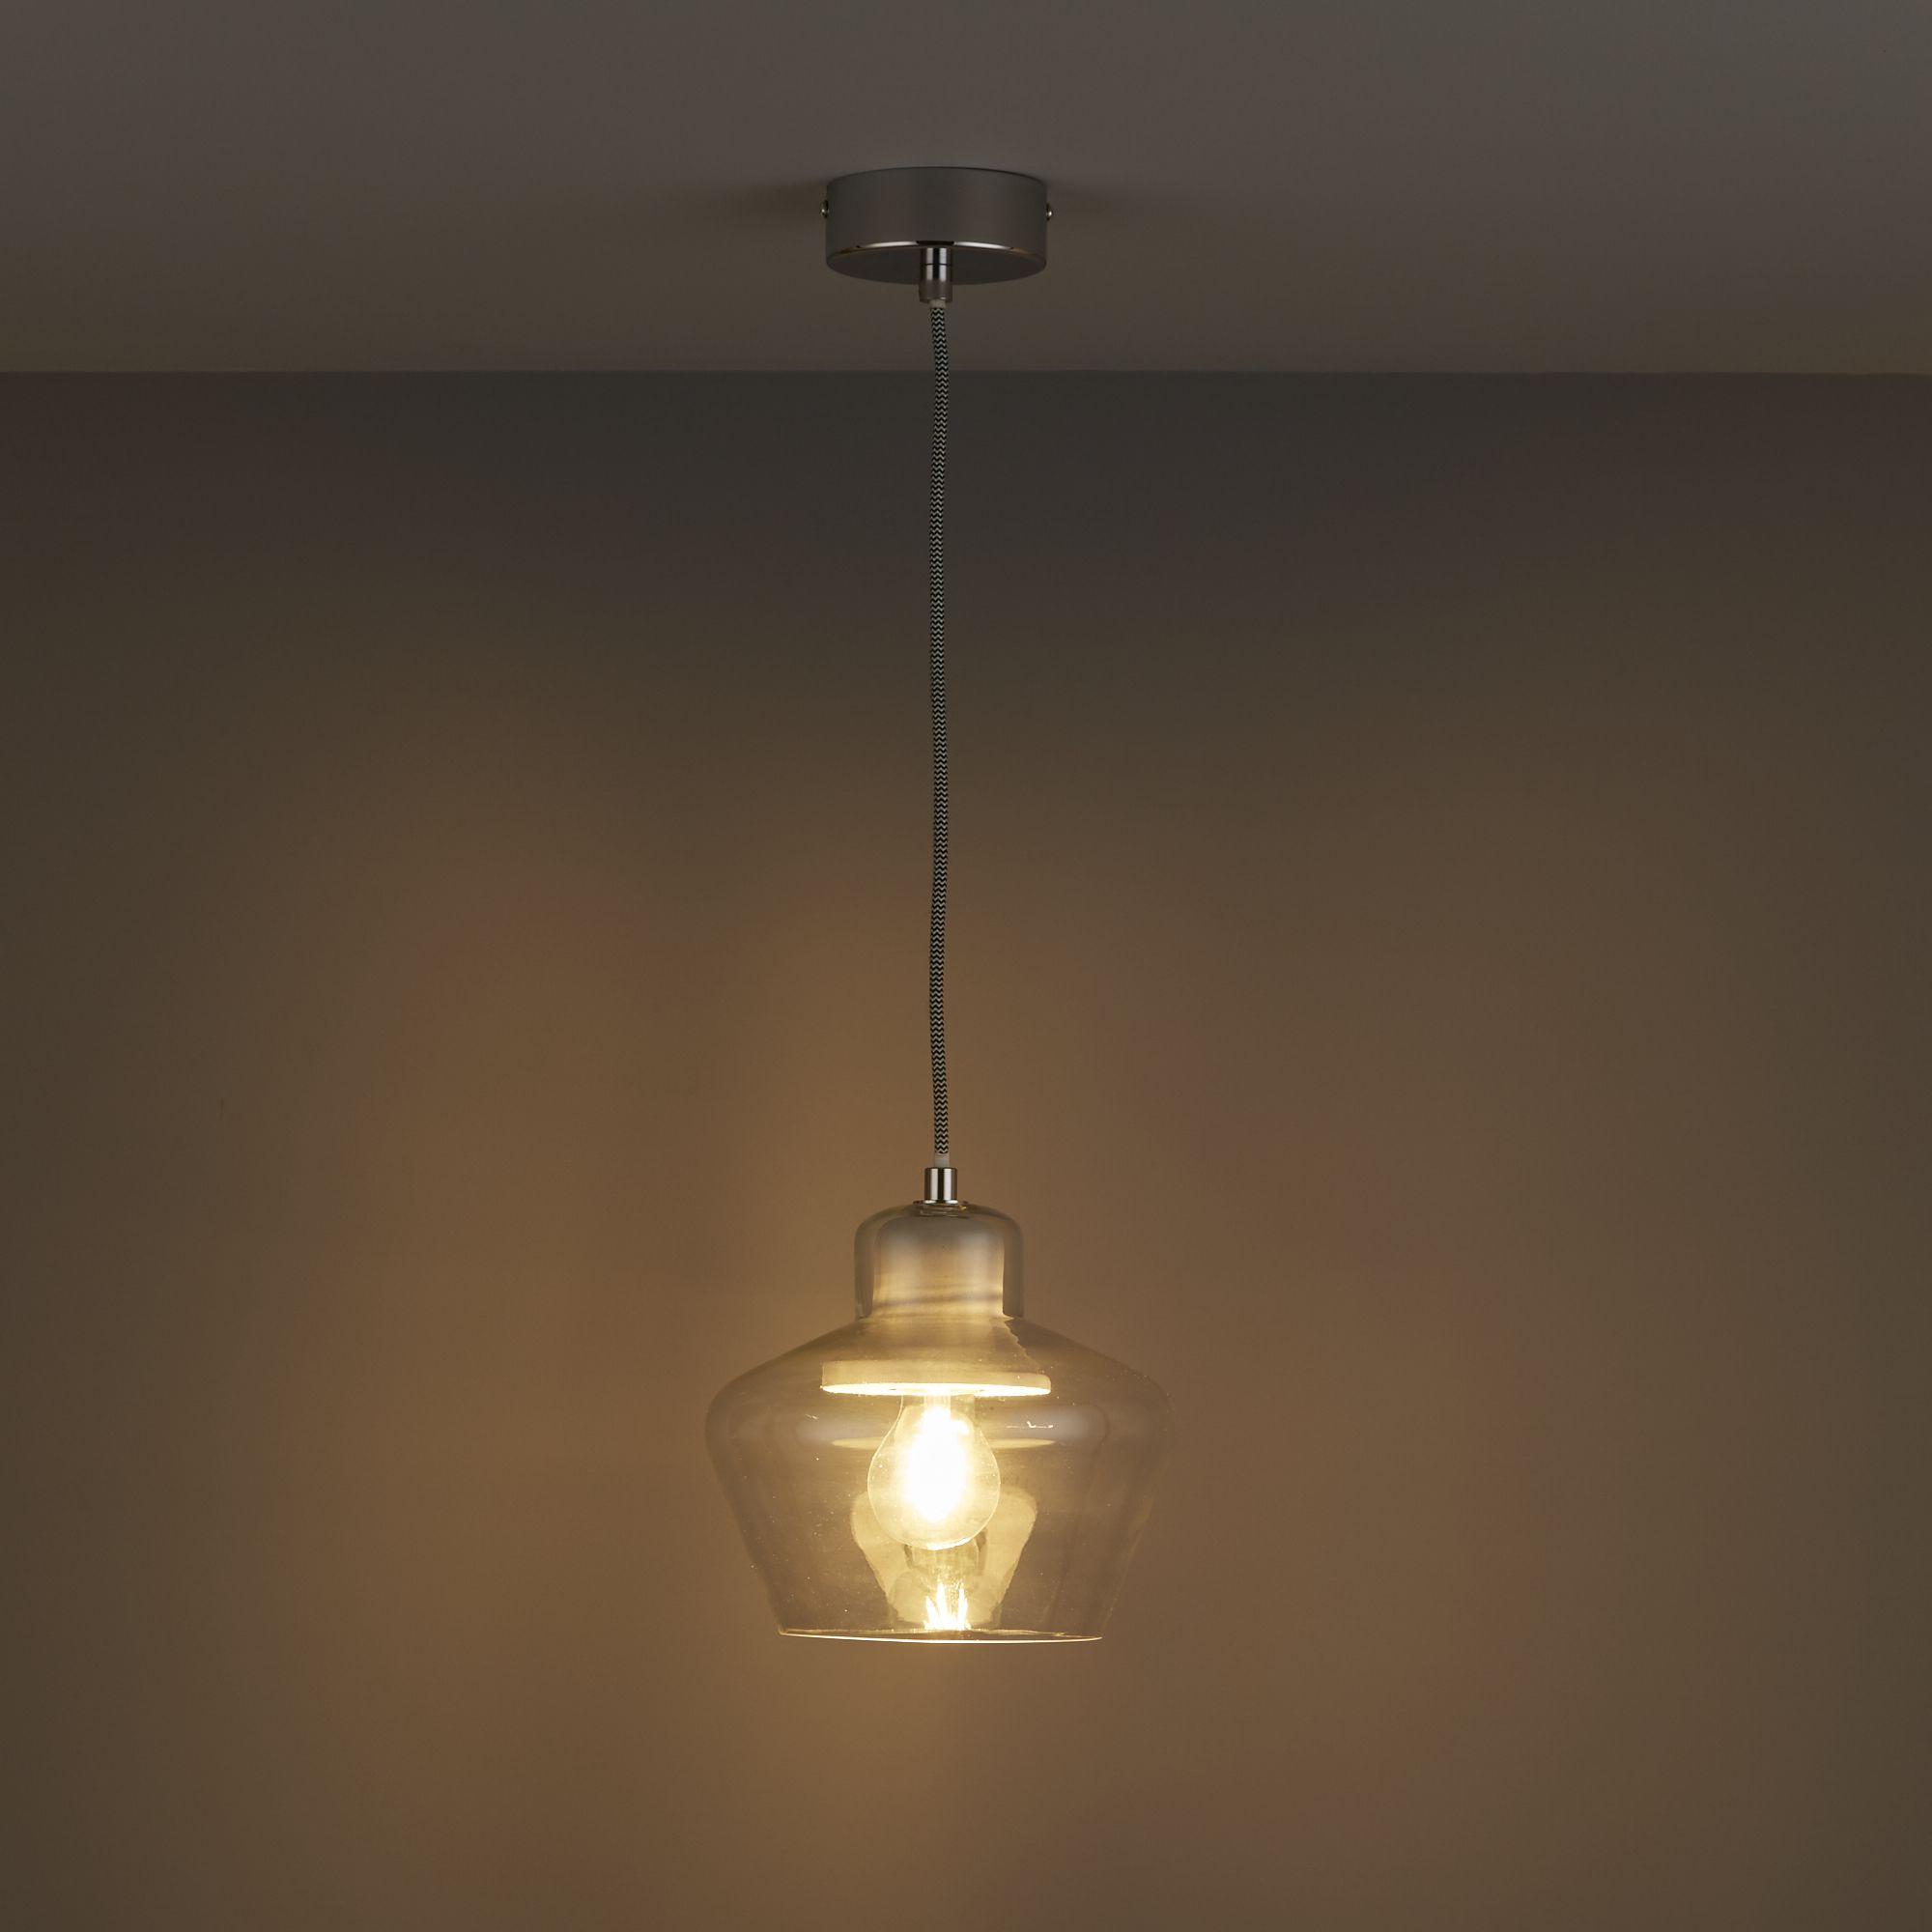 Jidda clear pendant ceiling light small departments diy at bq aloadofball Choice Image